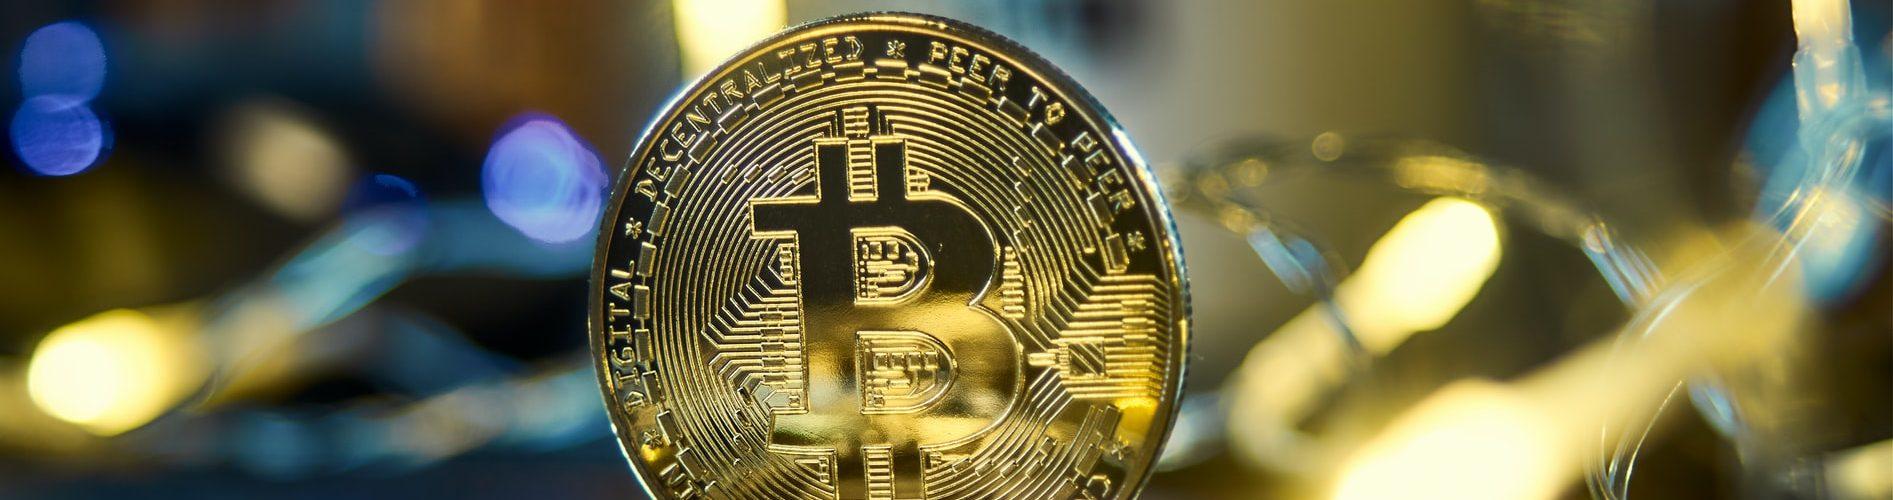 bitcoin-munt-lampjes